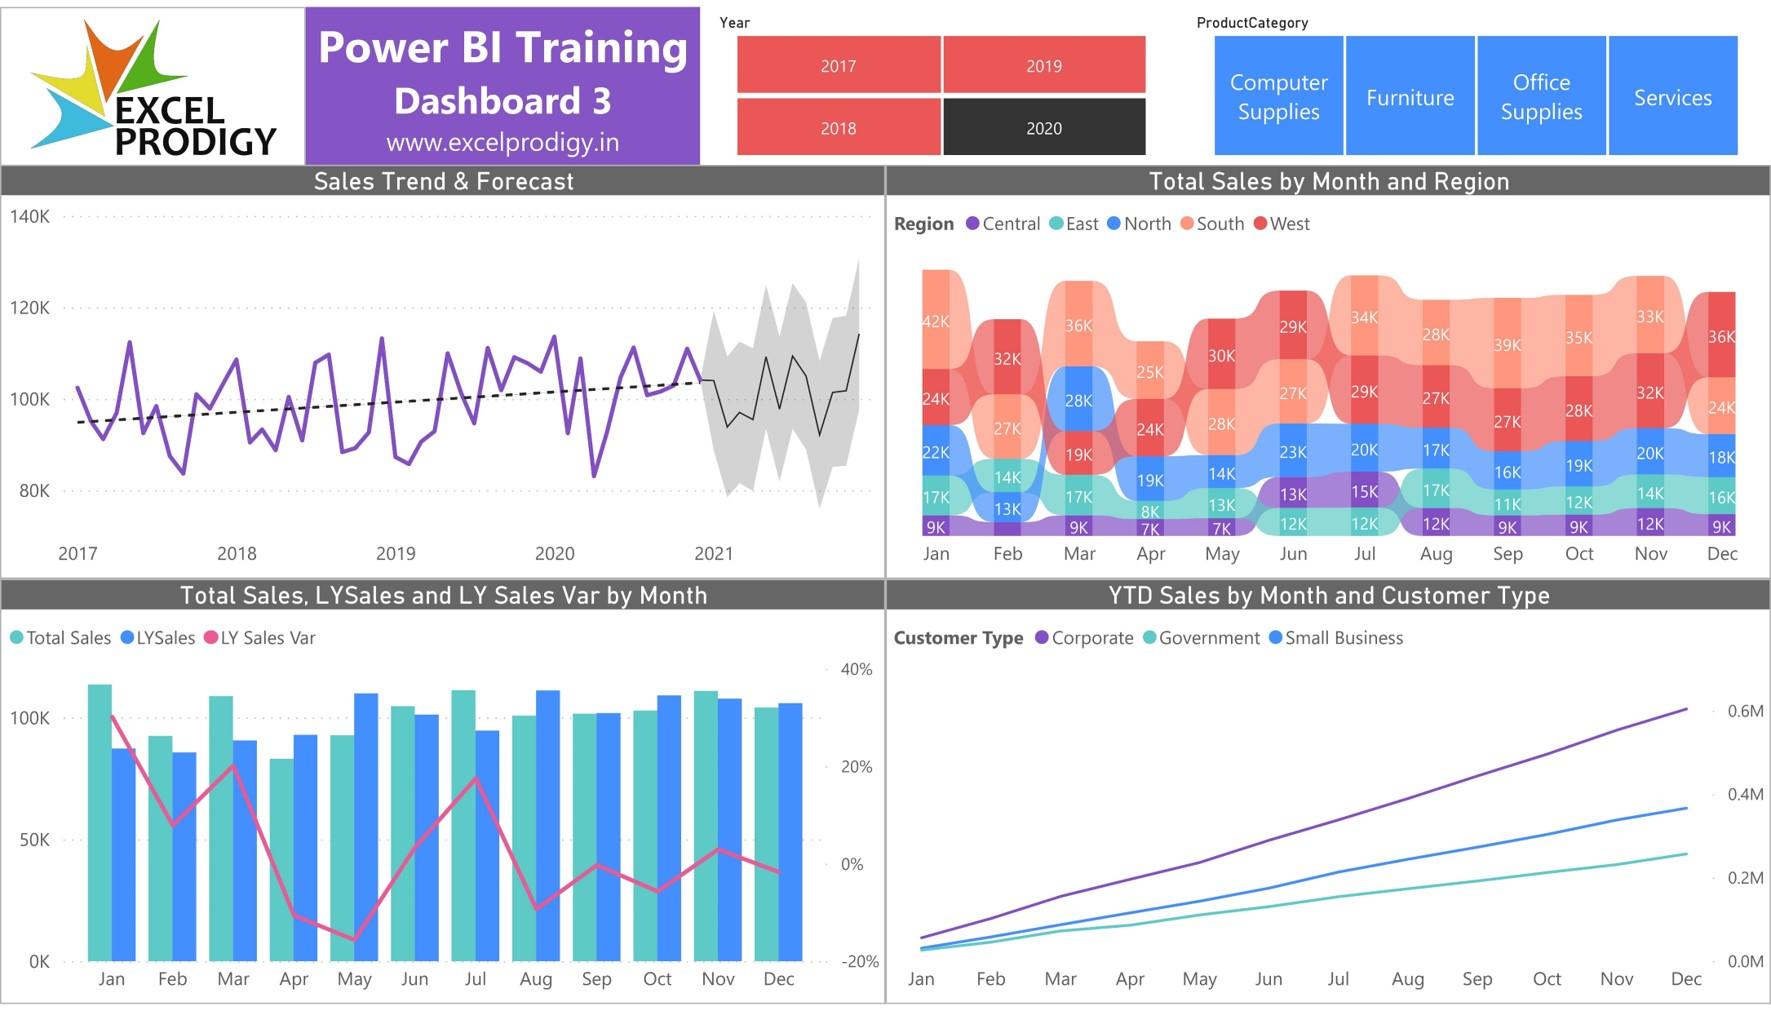 Power Bi Training - Dashboard 3